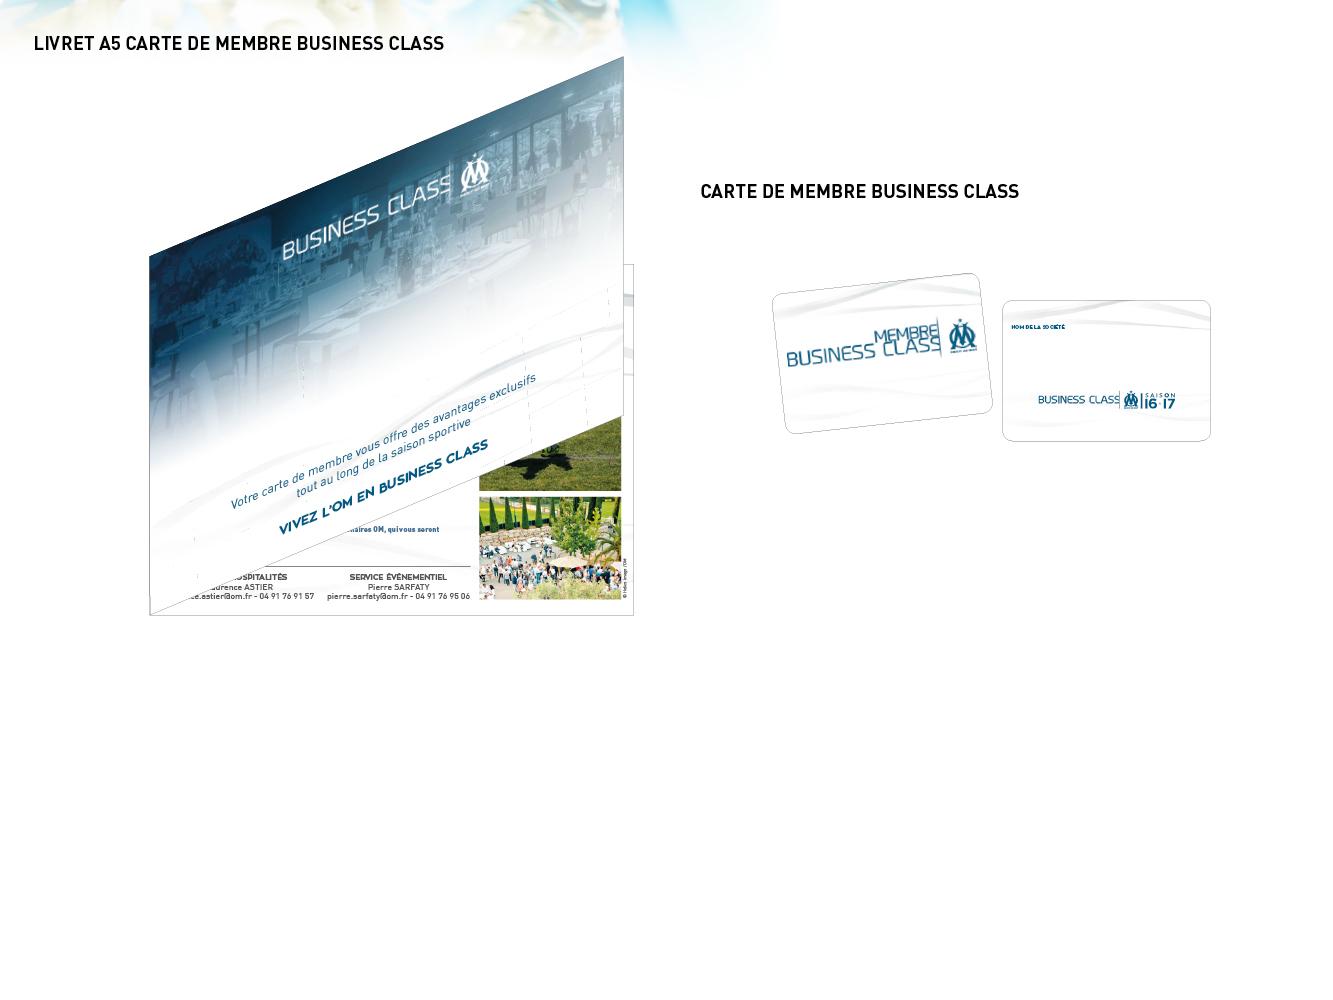 livret et carte de membre OM Business Class